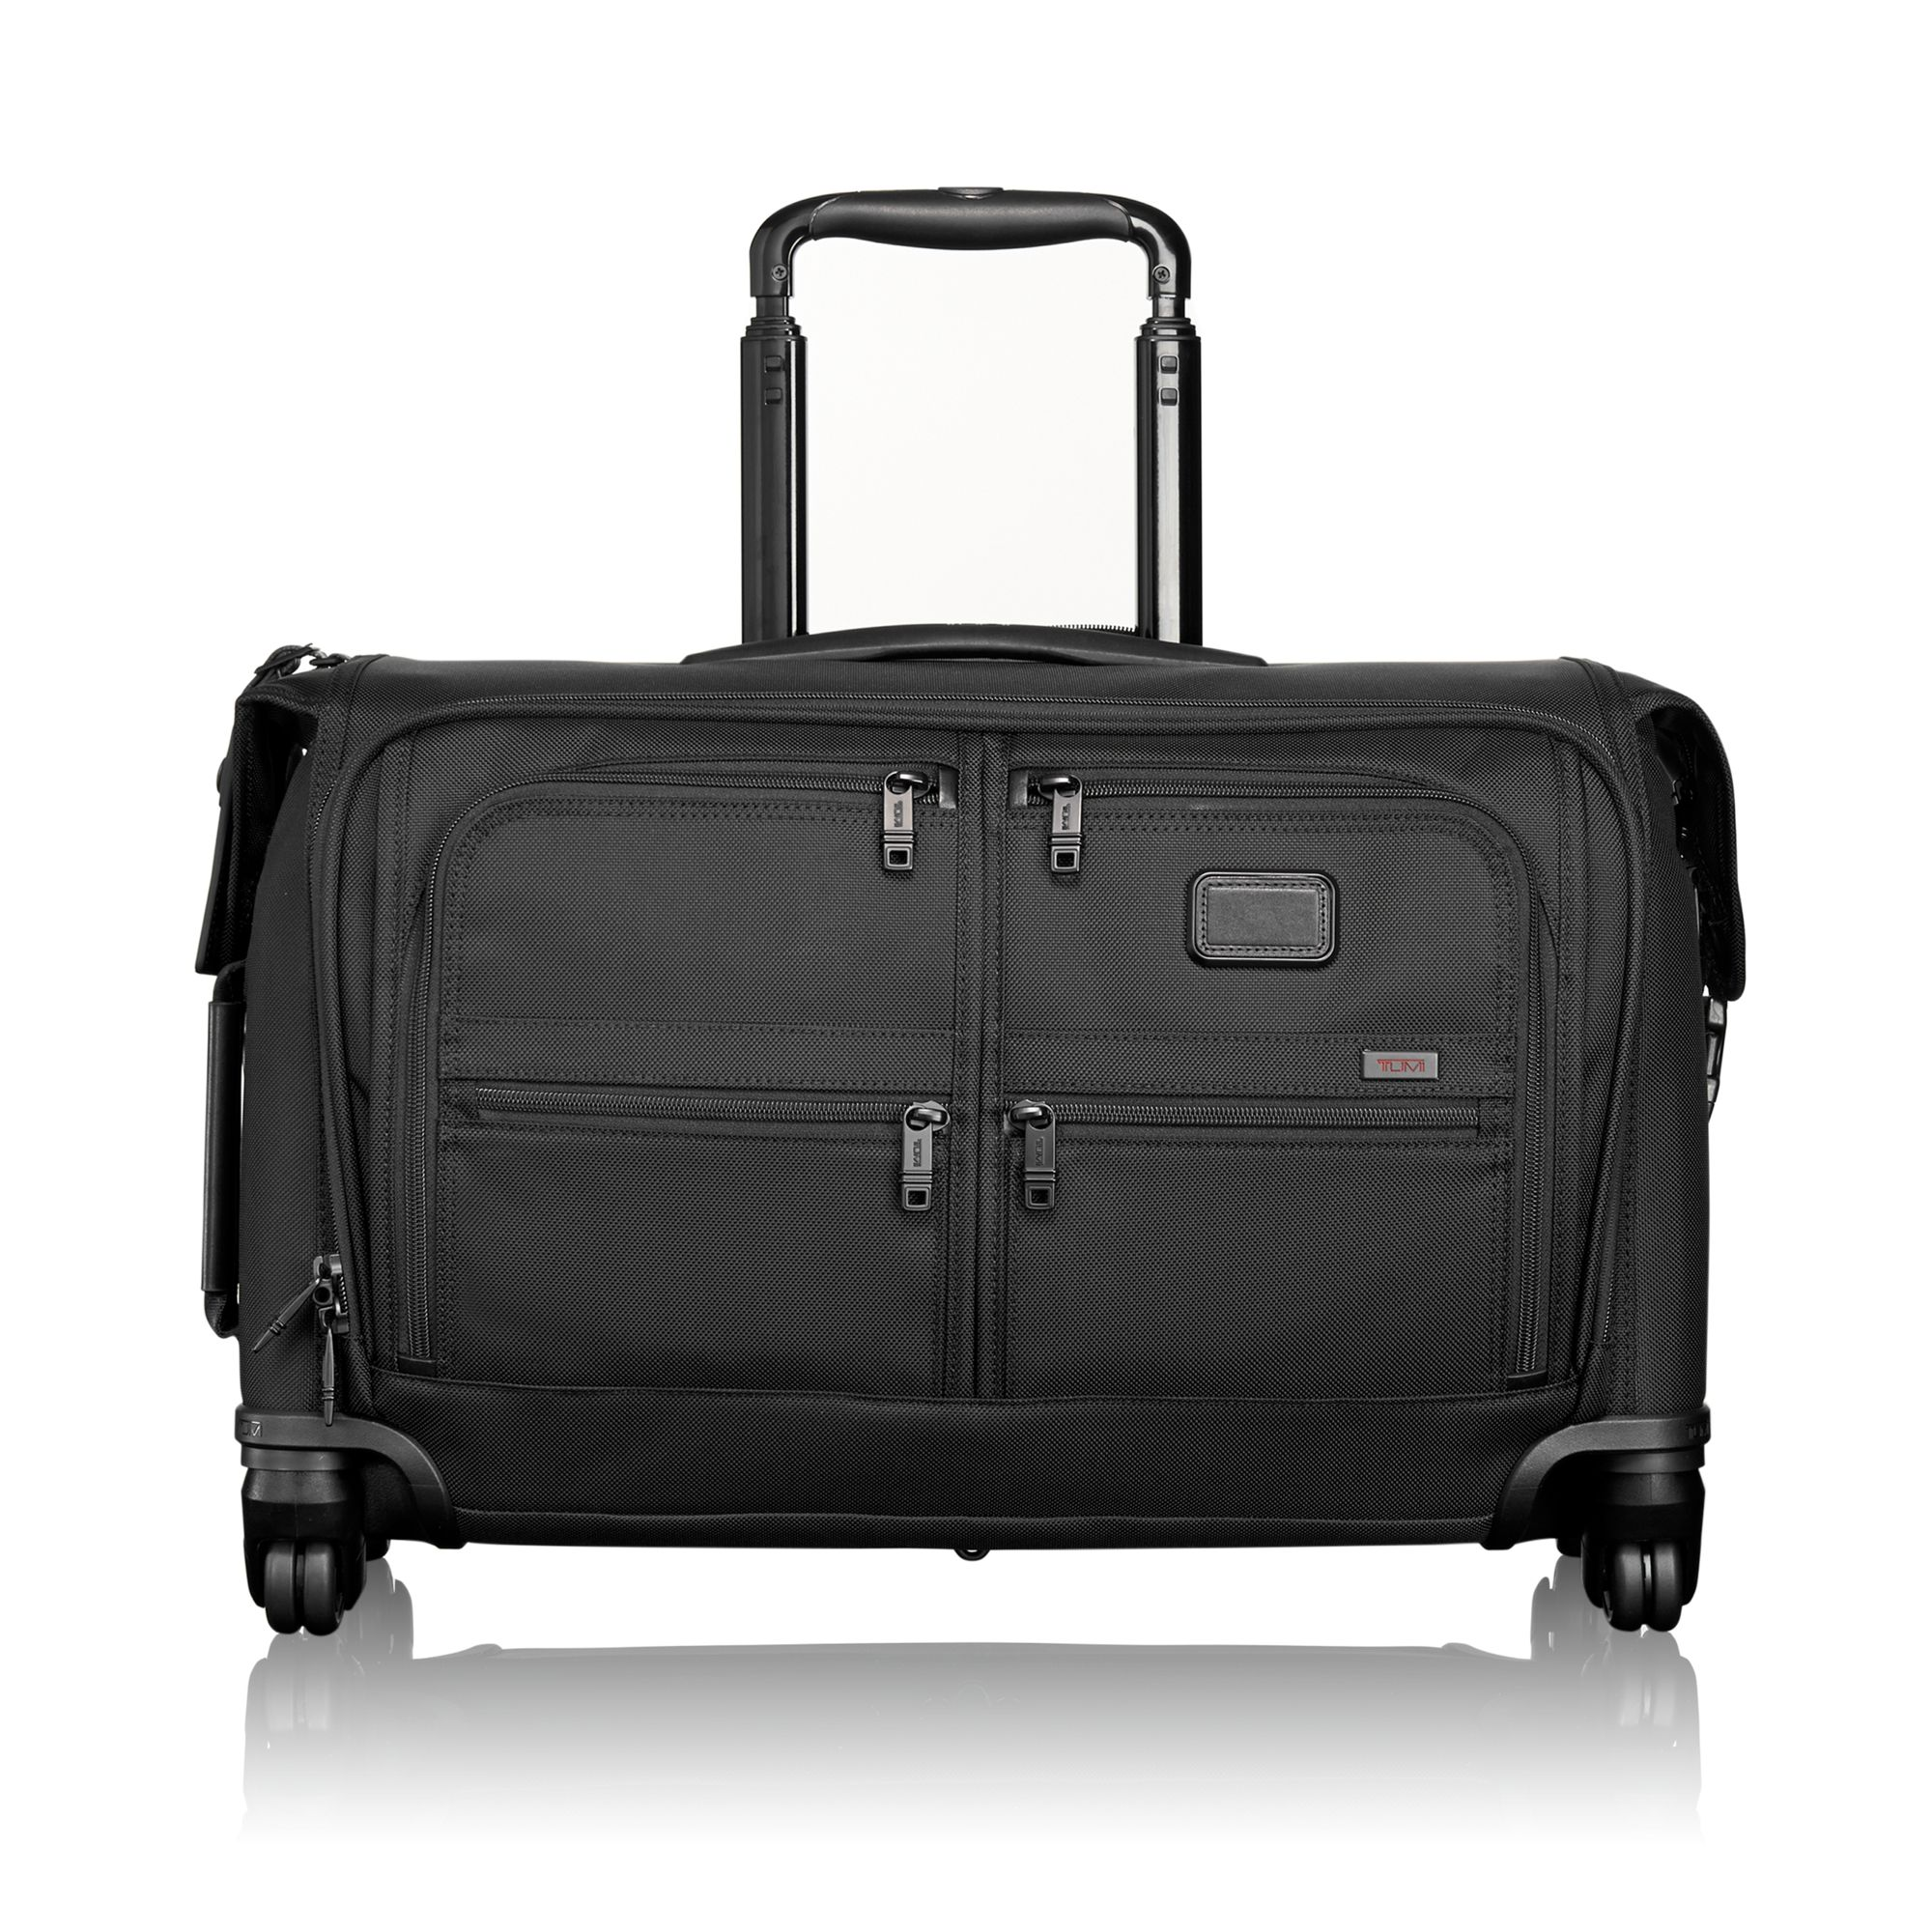 Carry-On 4 Wheeled Garment Bag - Alpha 2 | Tumi United States